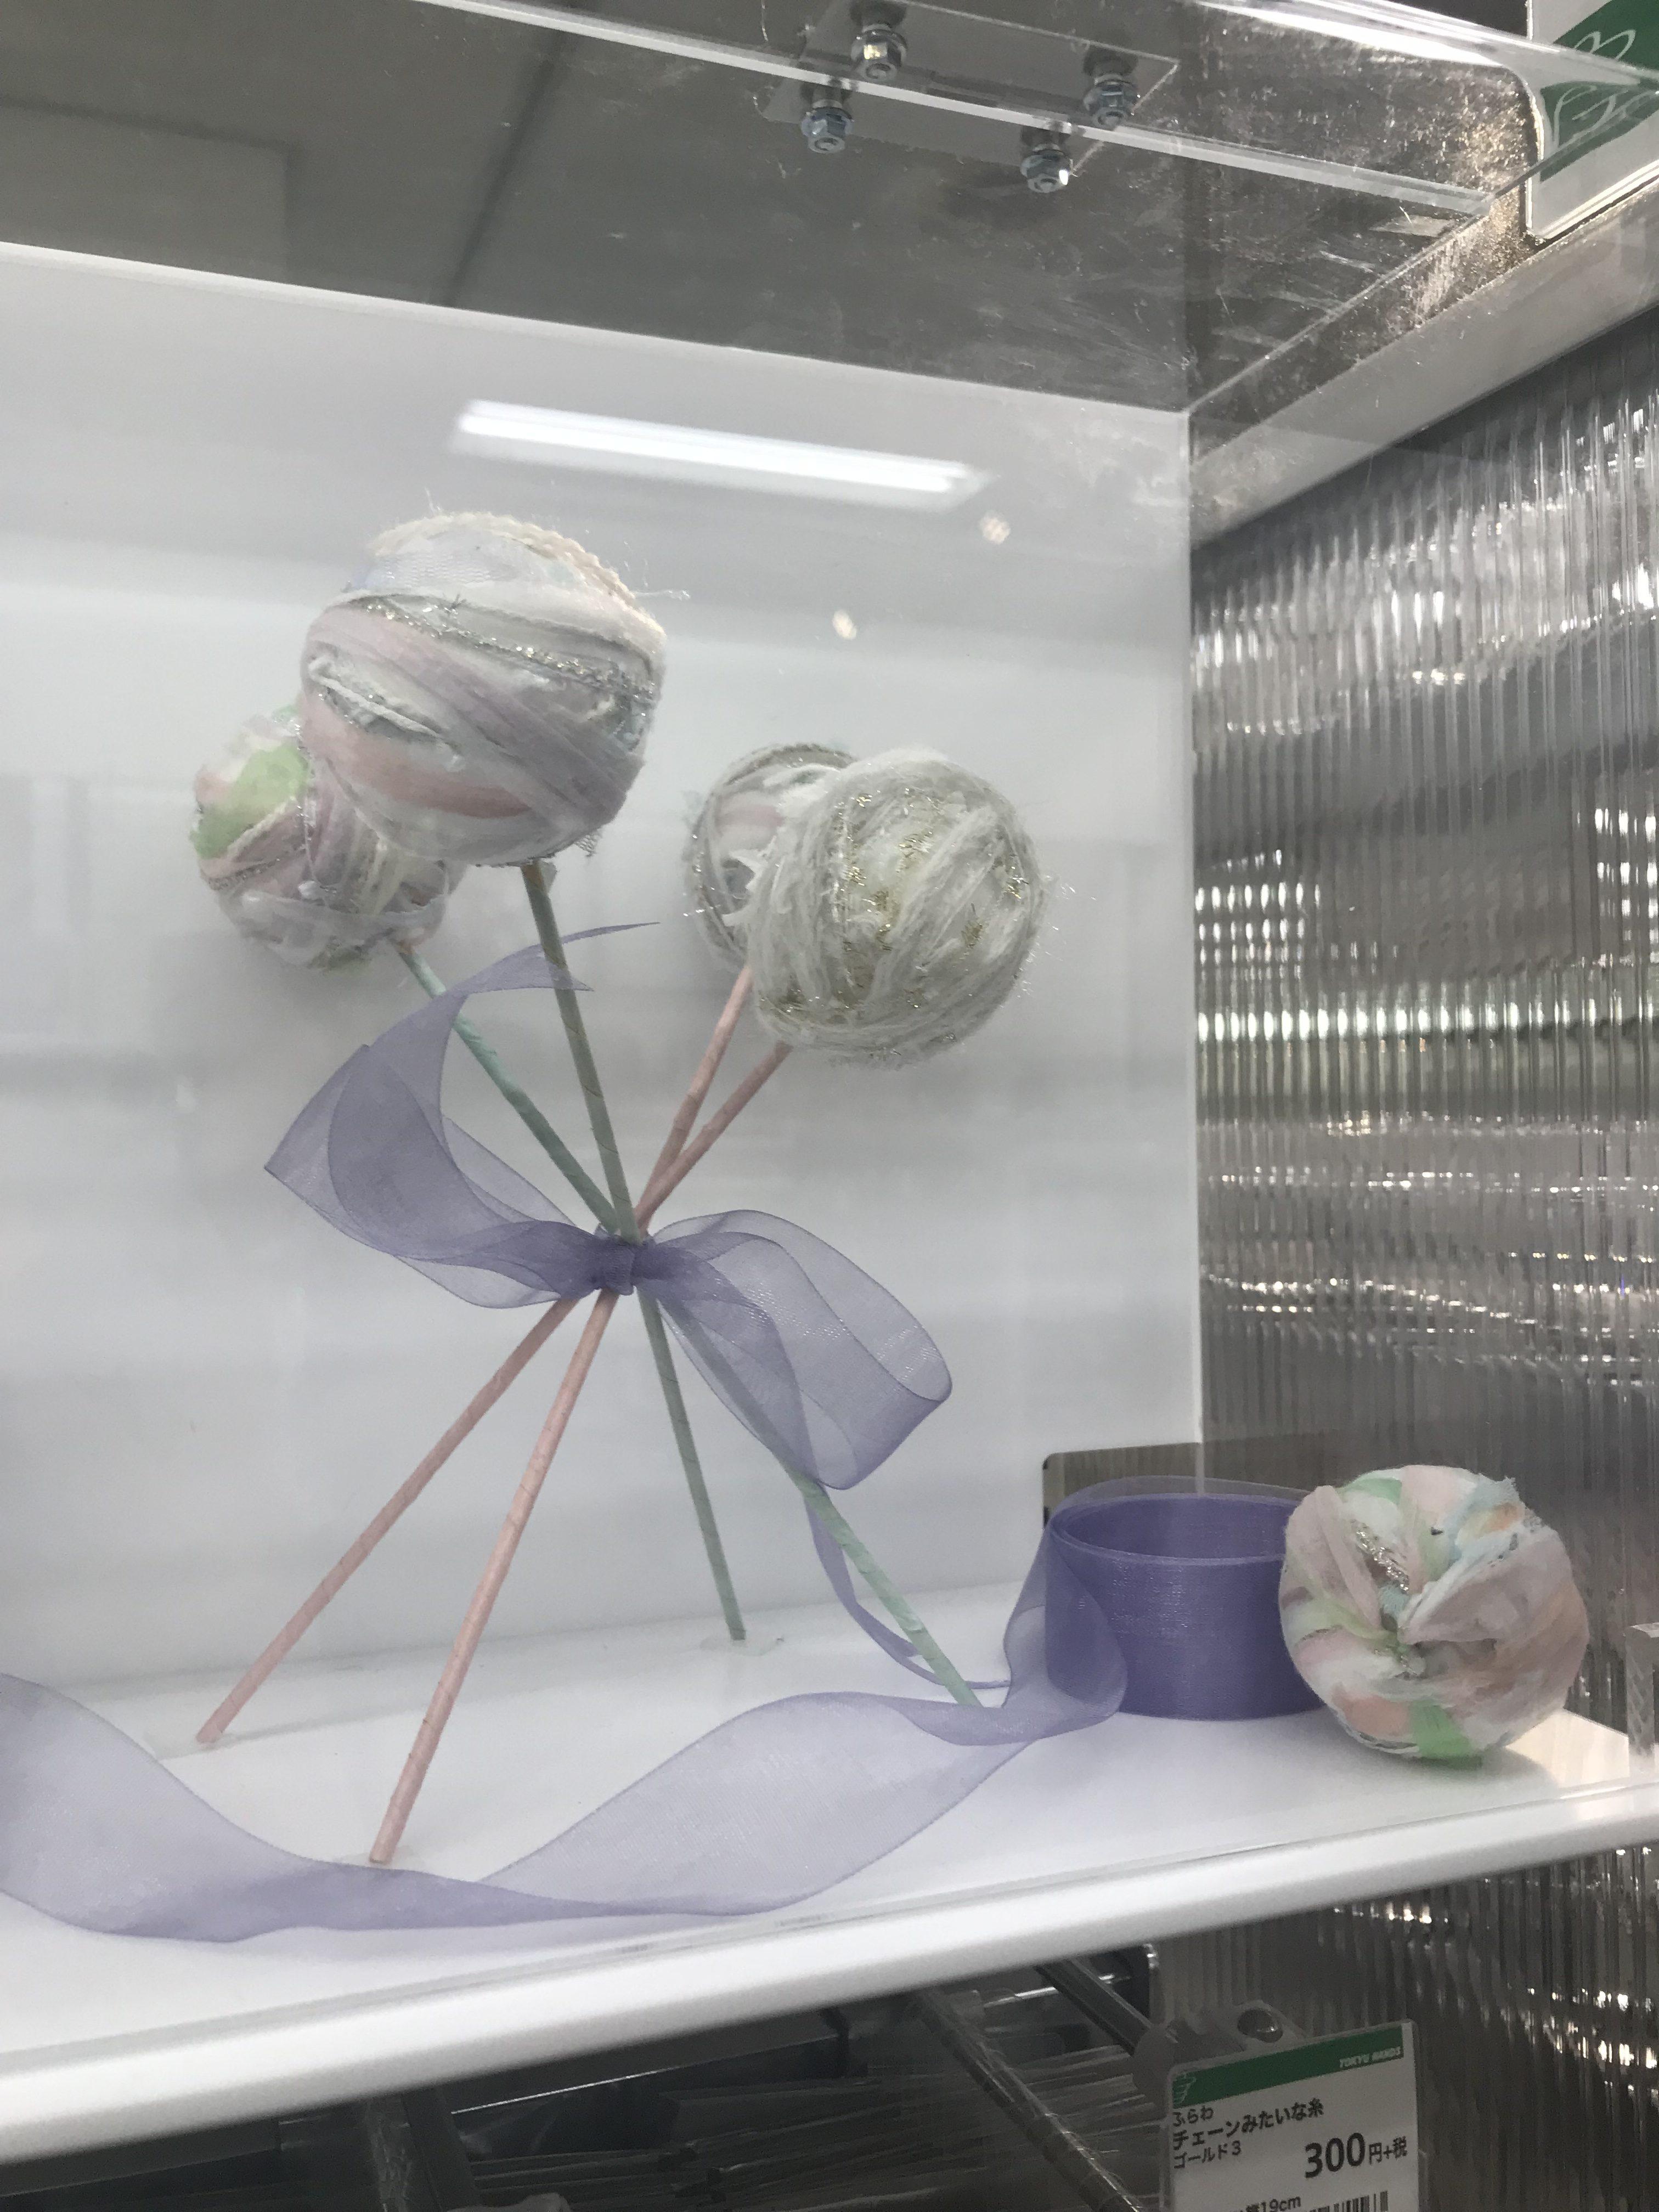 Tiny Rabbit Hole – Craft shop amigurumi crochet yarn leather uv calligraphy tokyu hands tokyo cloth